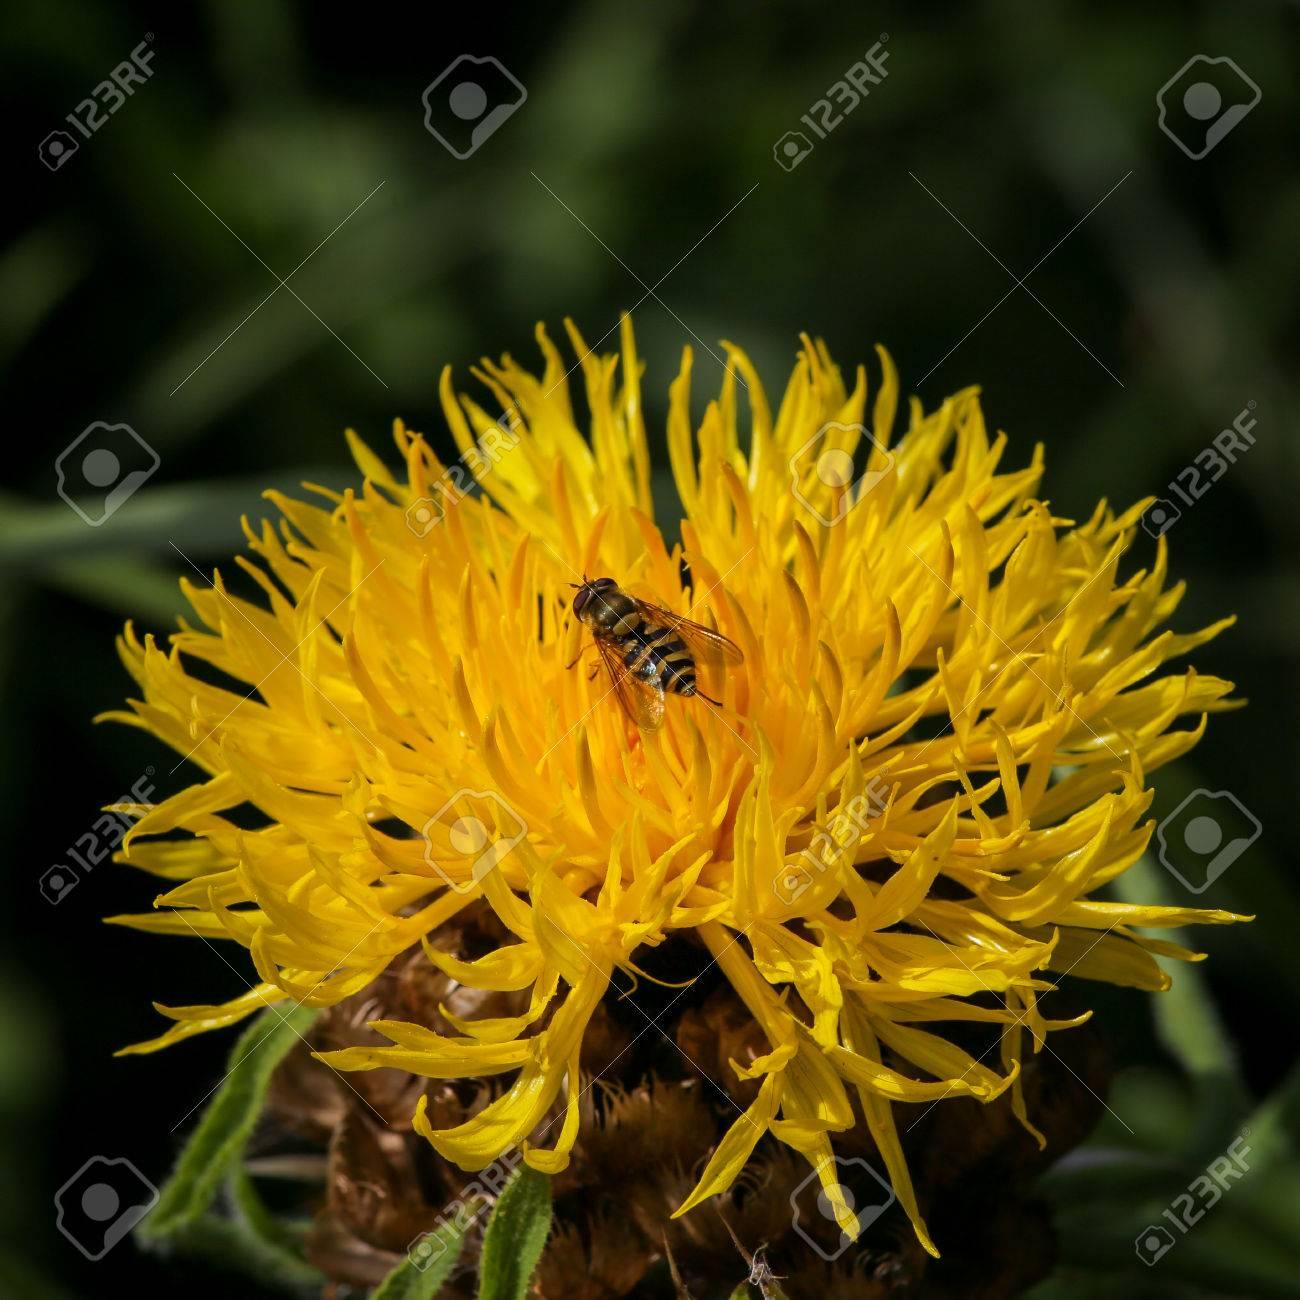 Giant Knapweed Bighead Centaurea Macrocephala Yellow Thistle Stock Photo Picture And Royalty Free Image Image 61618218